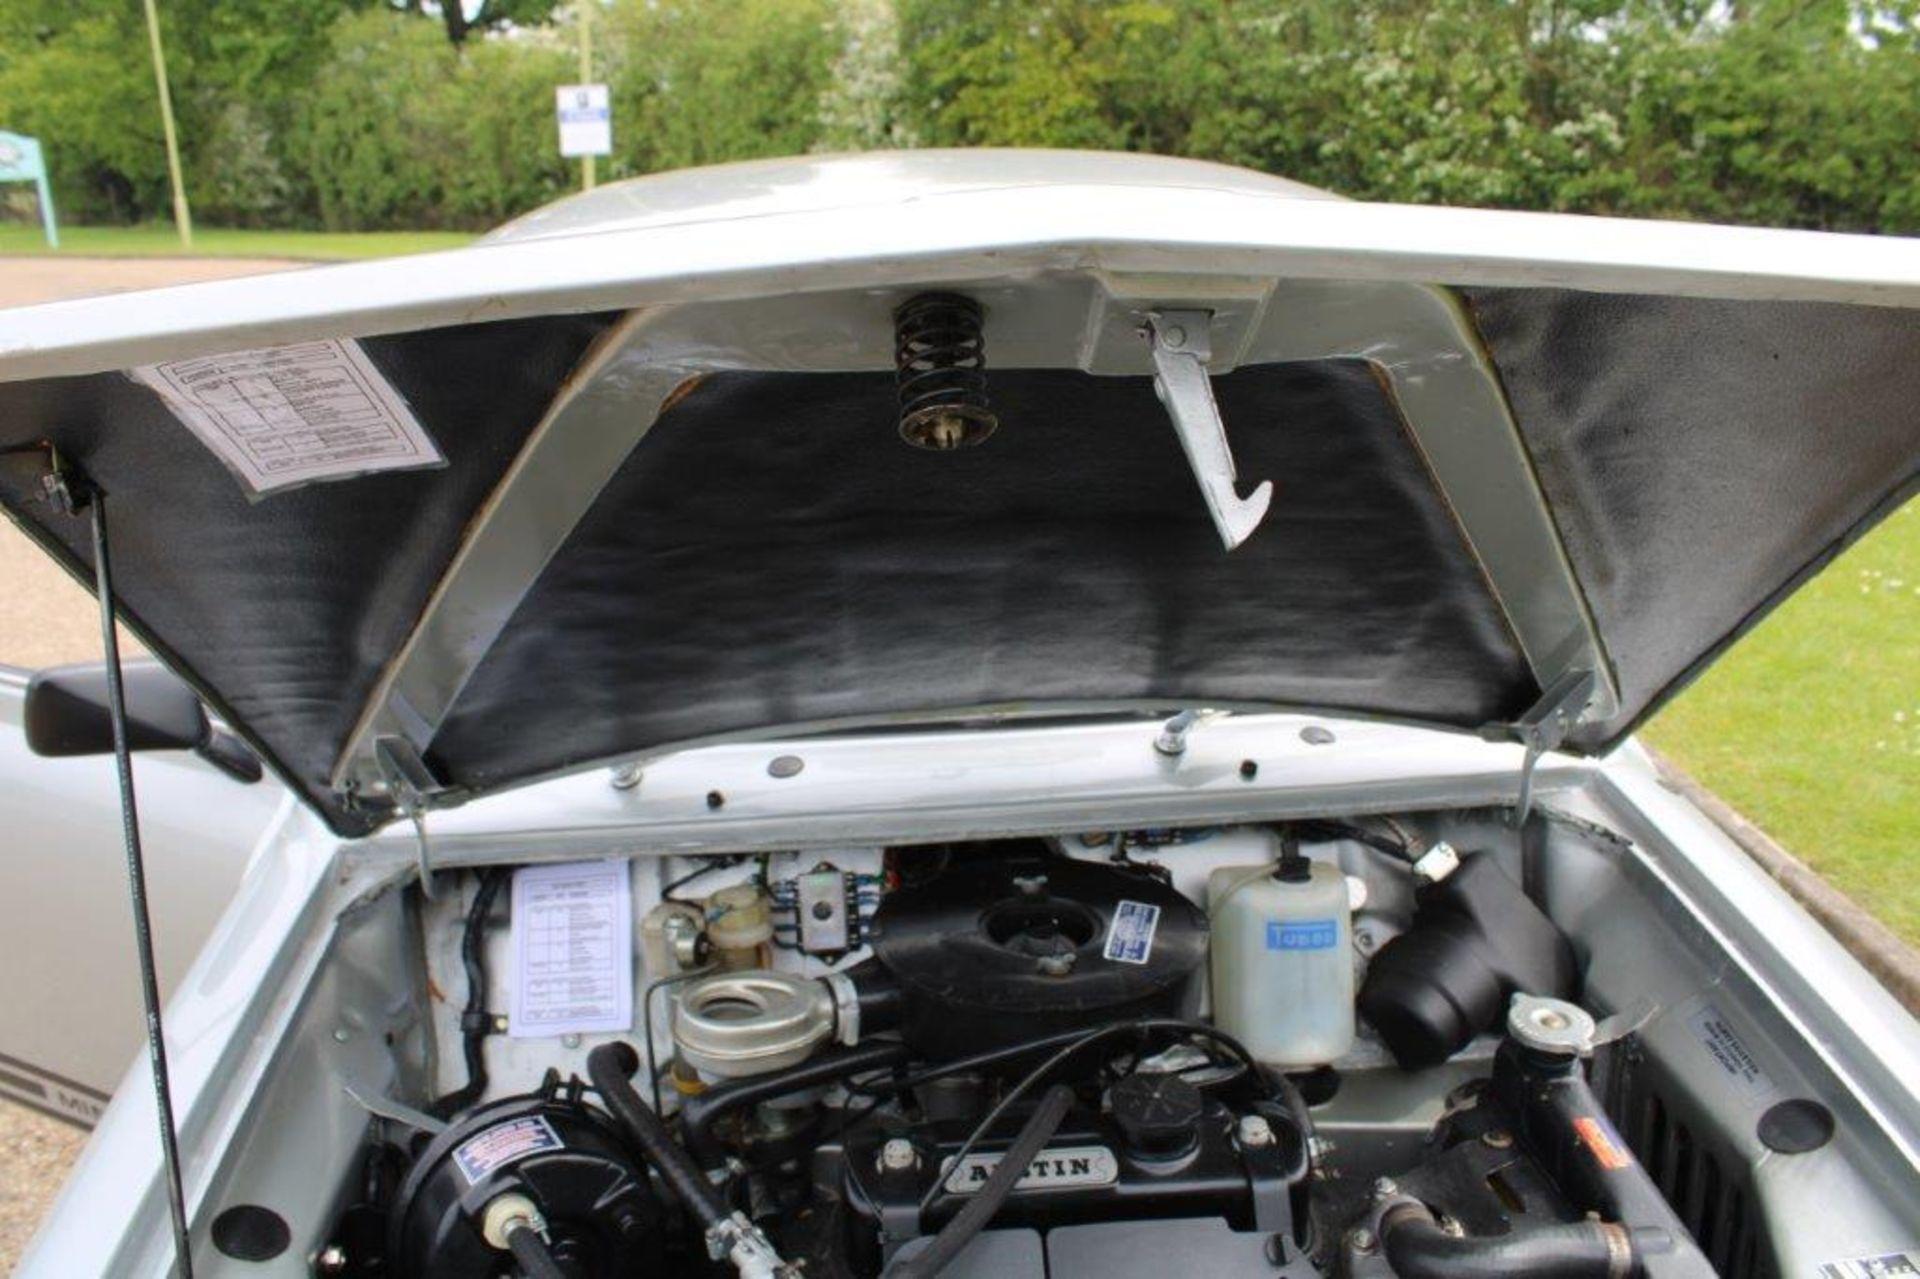 1980 Austin Morris Mini 1275 GT - Image 22 of 28